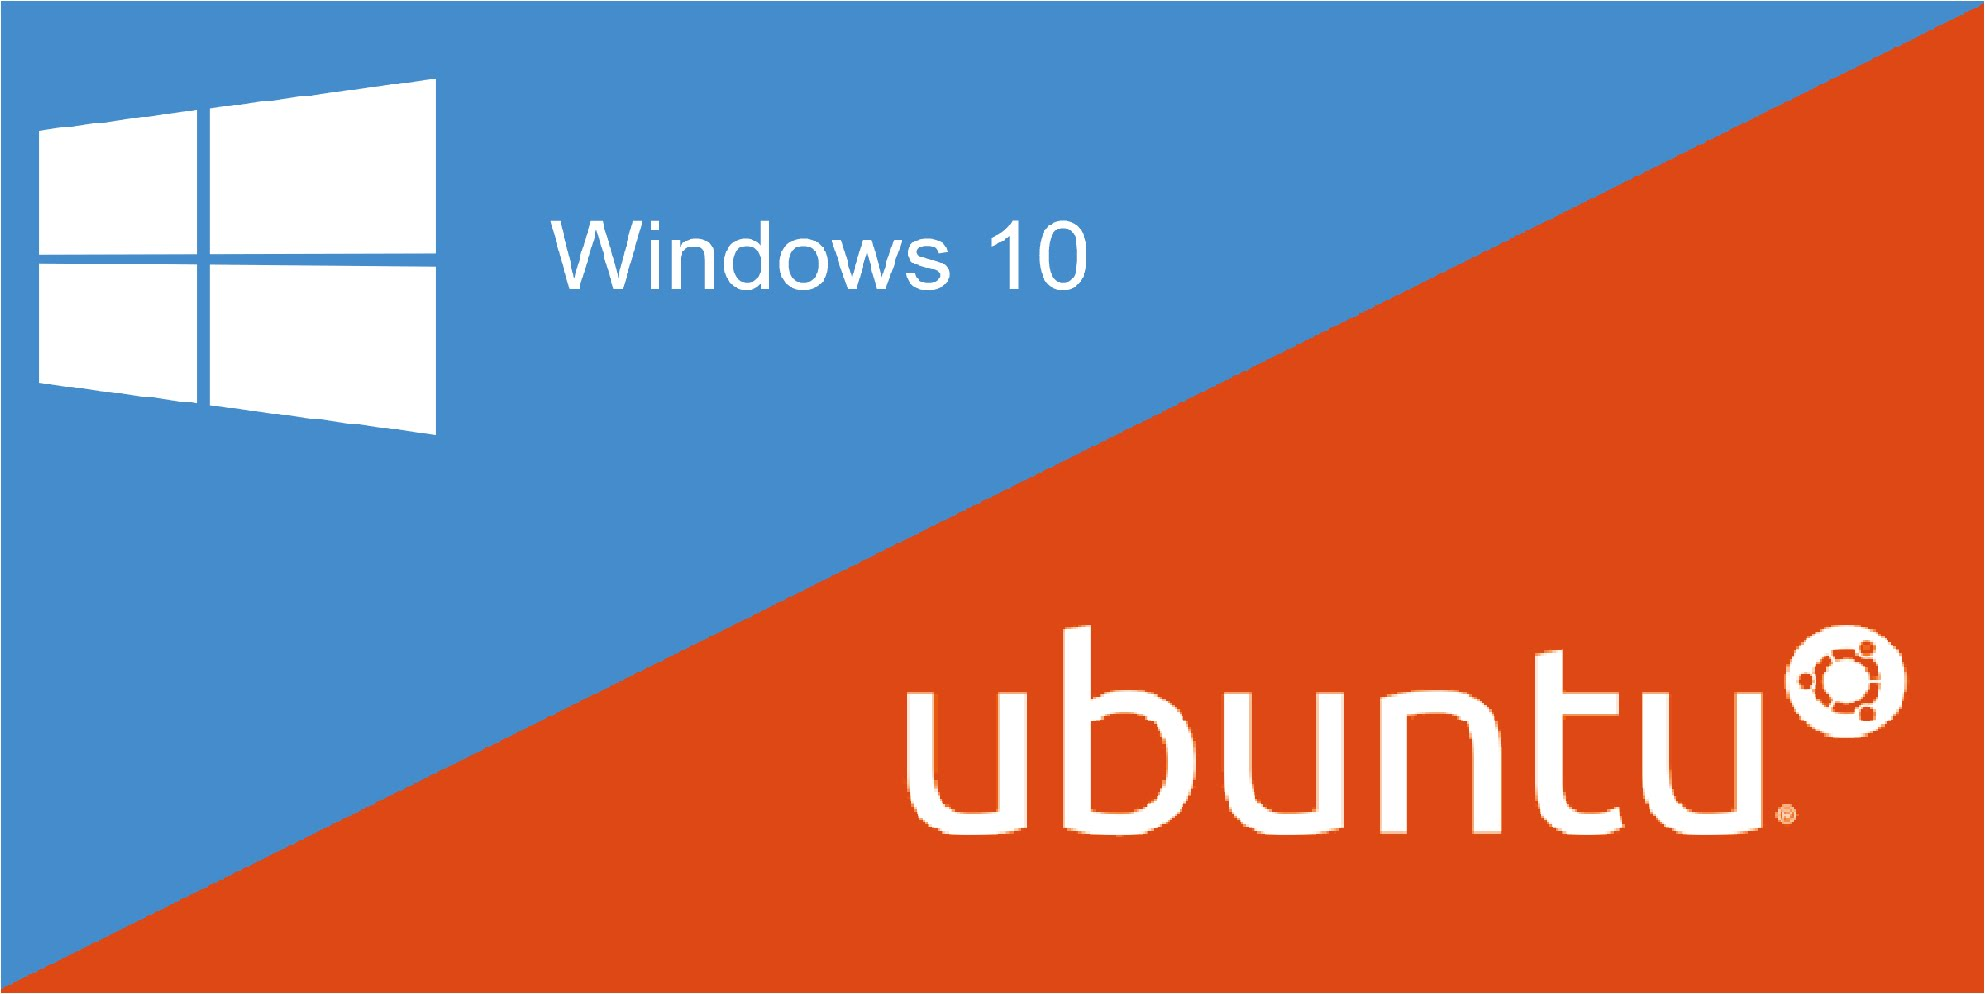 Come installare Ubuntu dal Windows Store in Windows 10 1